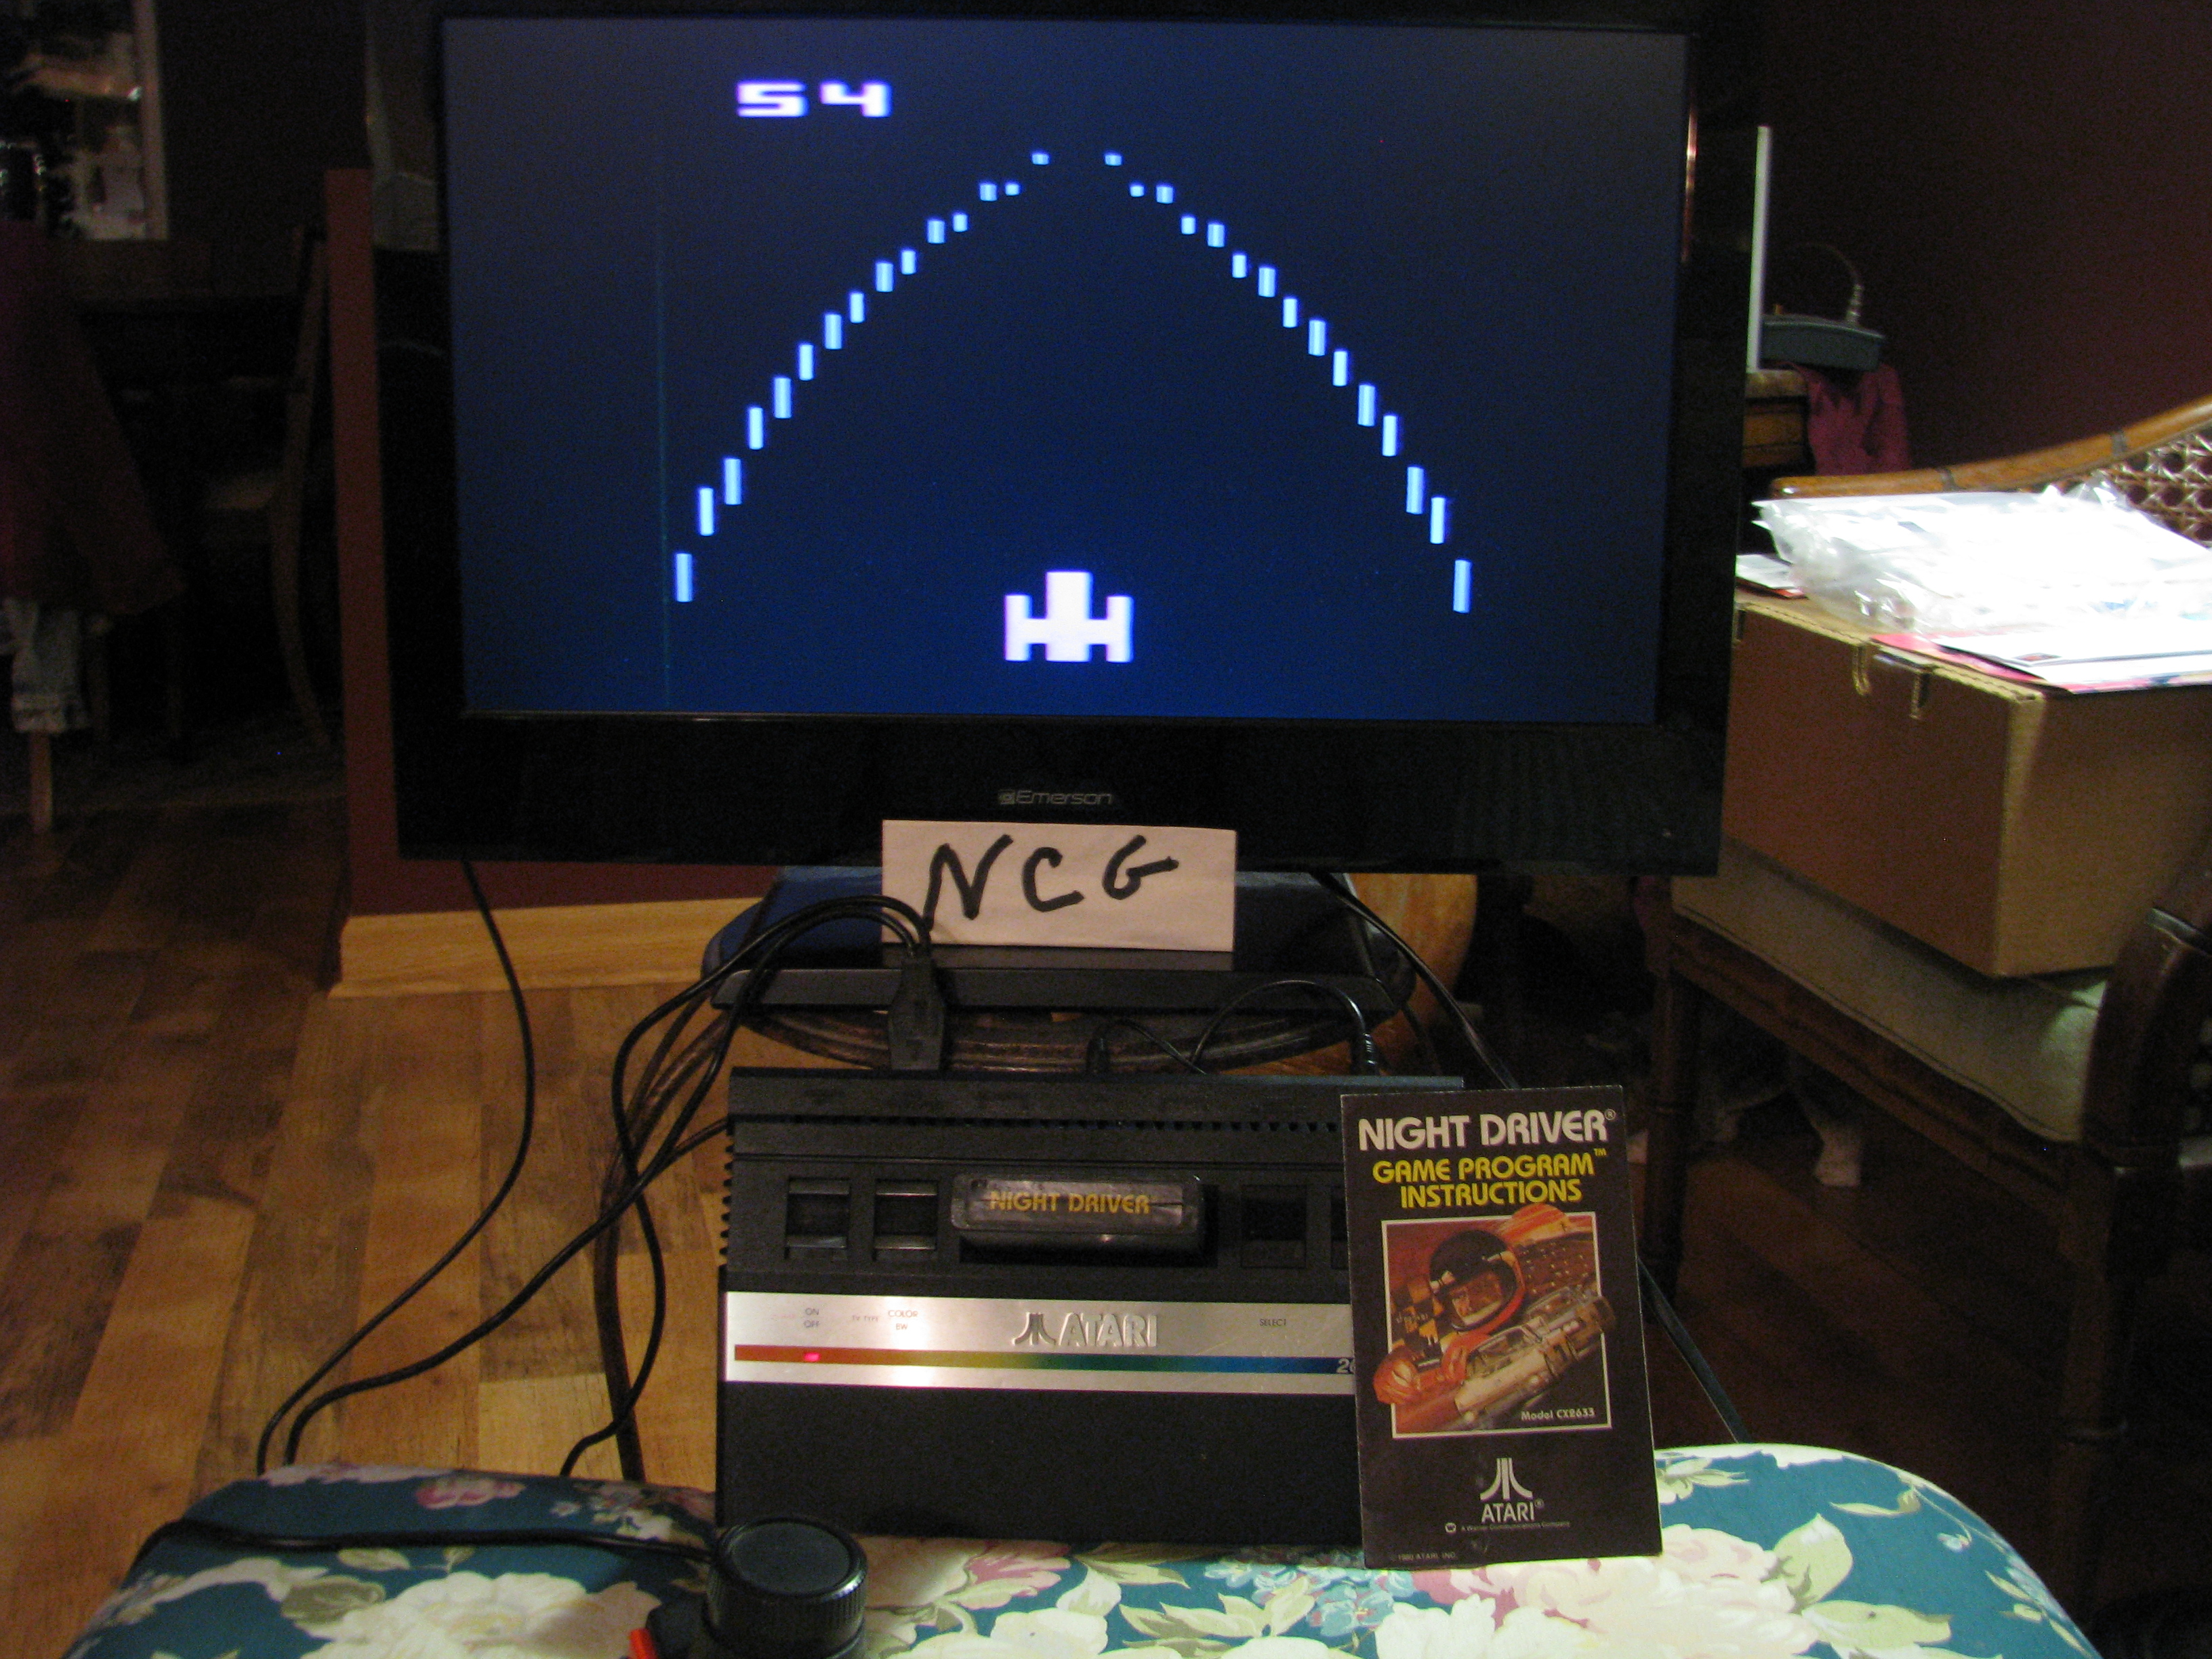 NorthCoastGamer: Night Driver (Atari 2600 Novice/B) 54 points on 2015-01-08 20:13:31